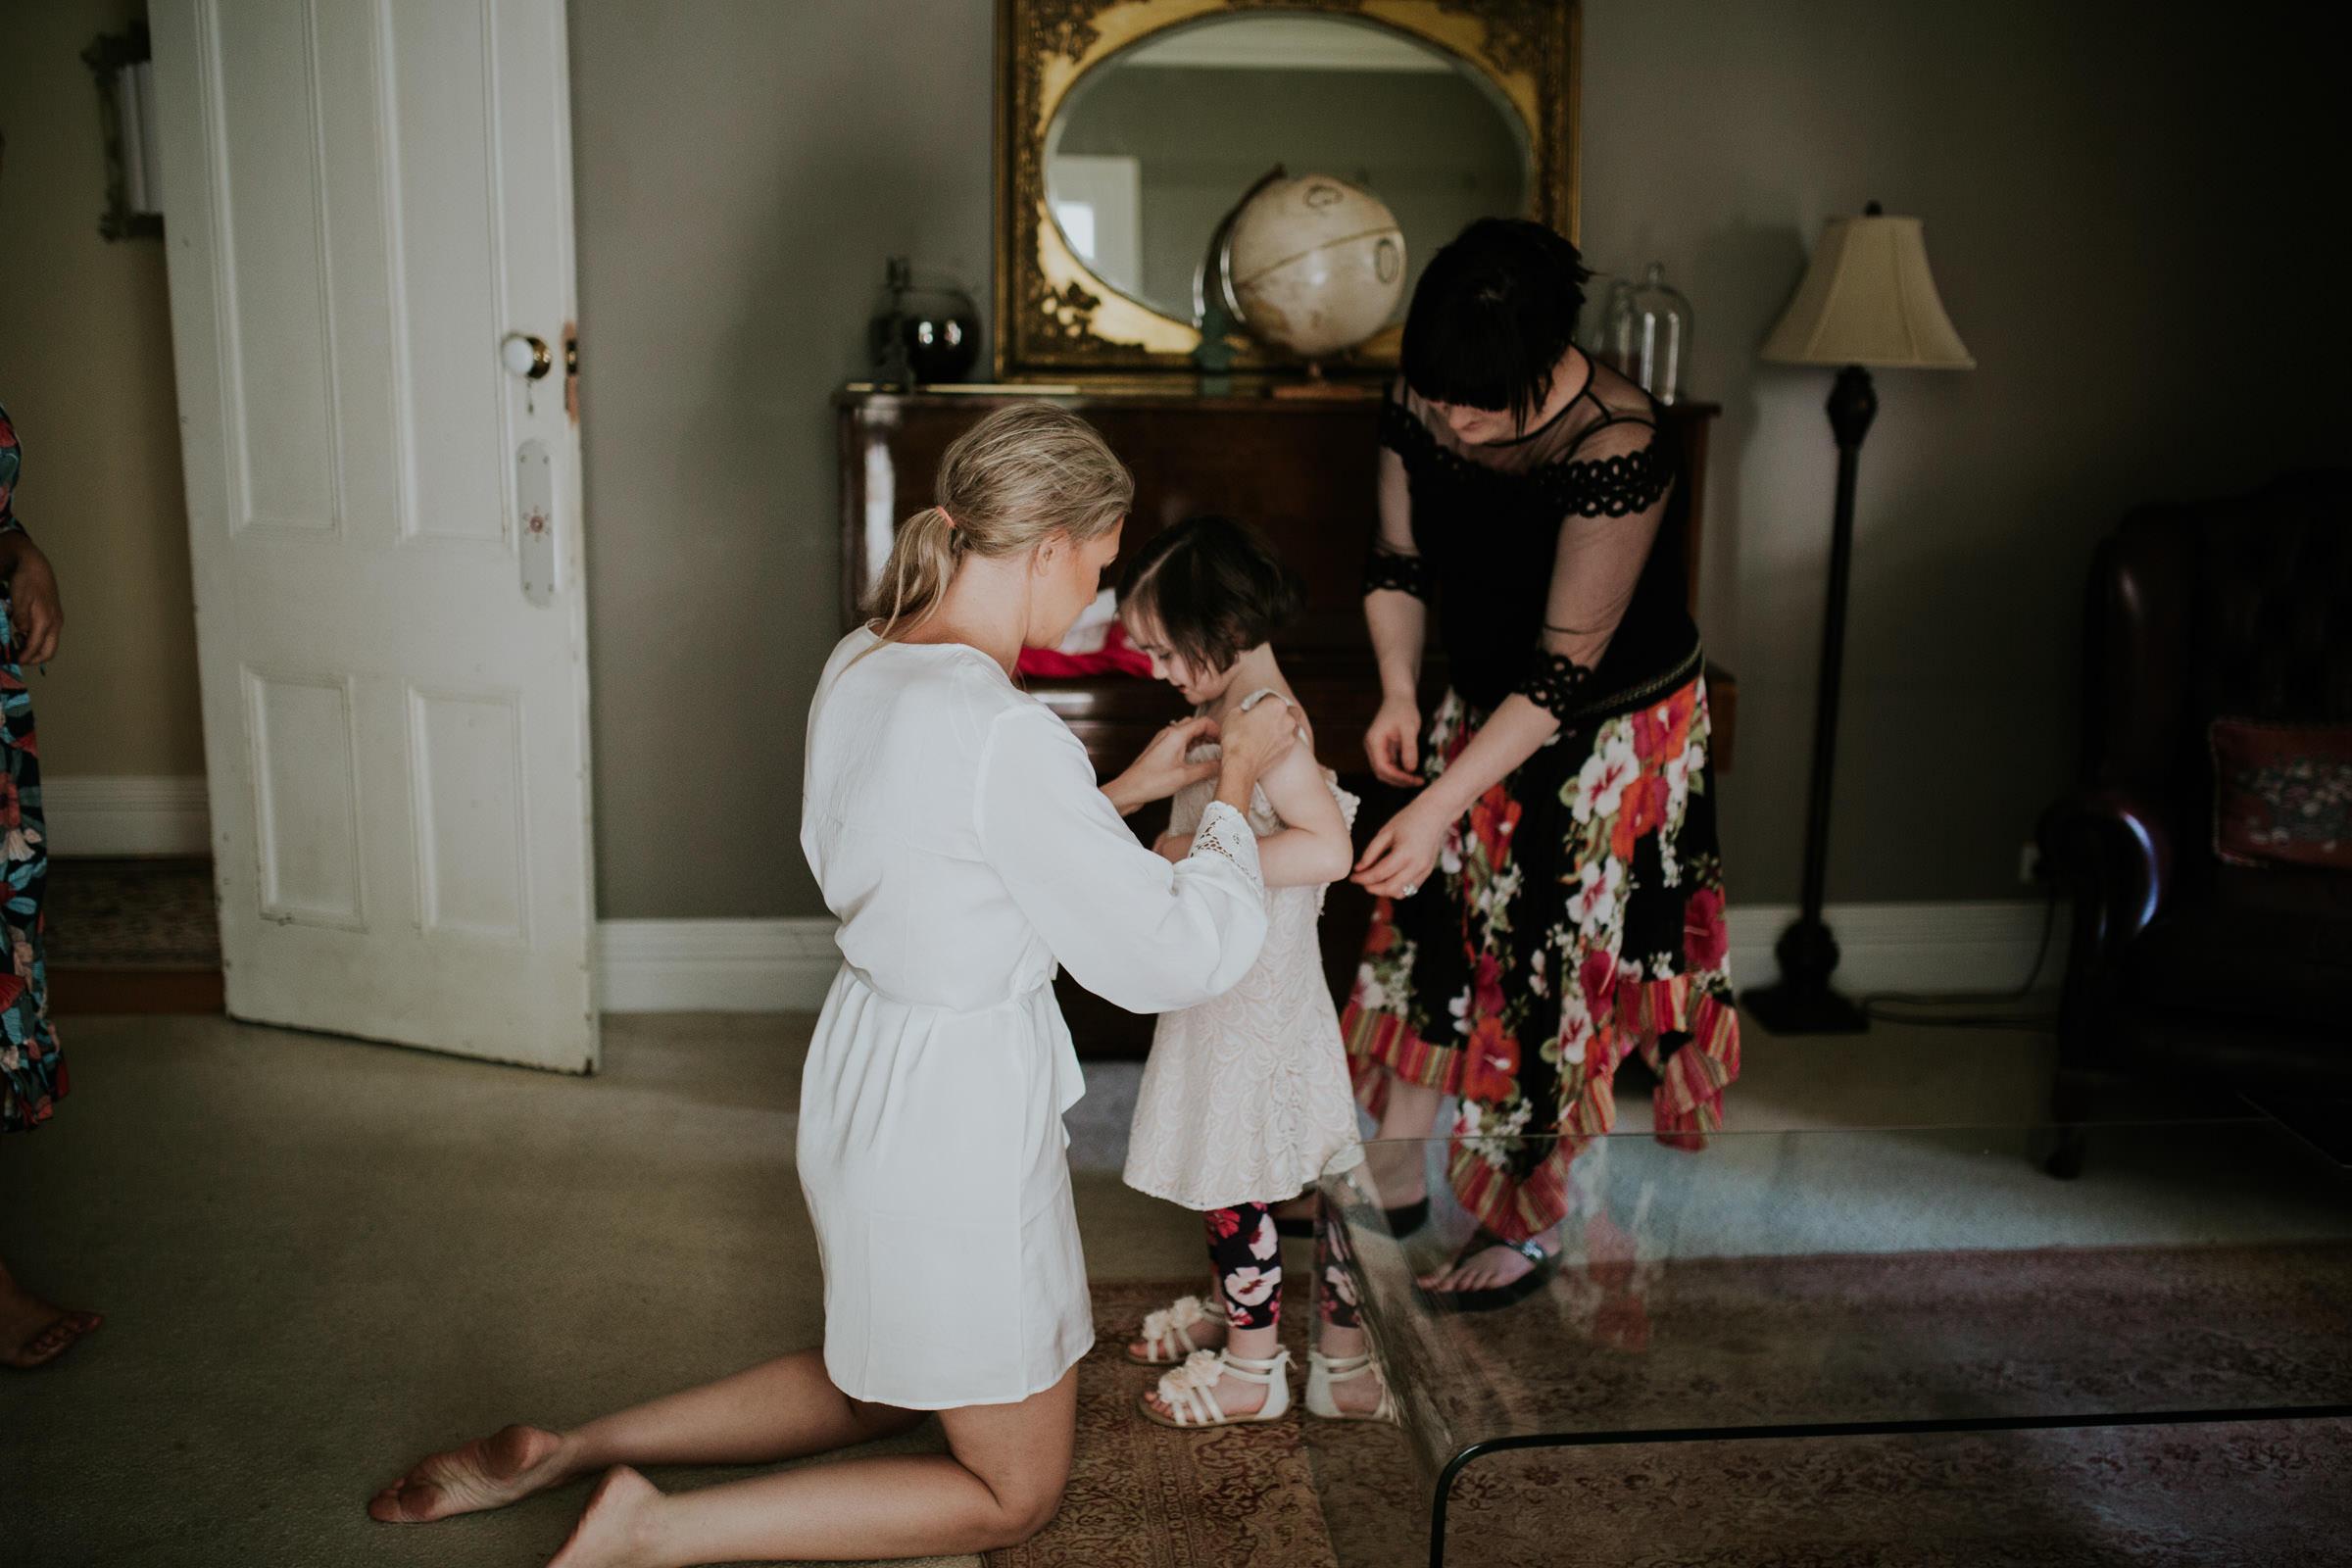 Emma+John+Far+South+Coast+Wedding+Festivl+Glamping+Bush-18.jpg